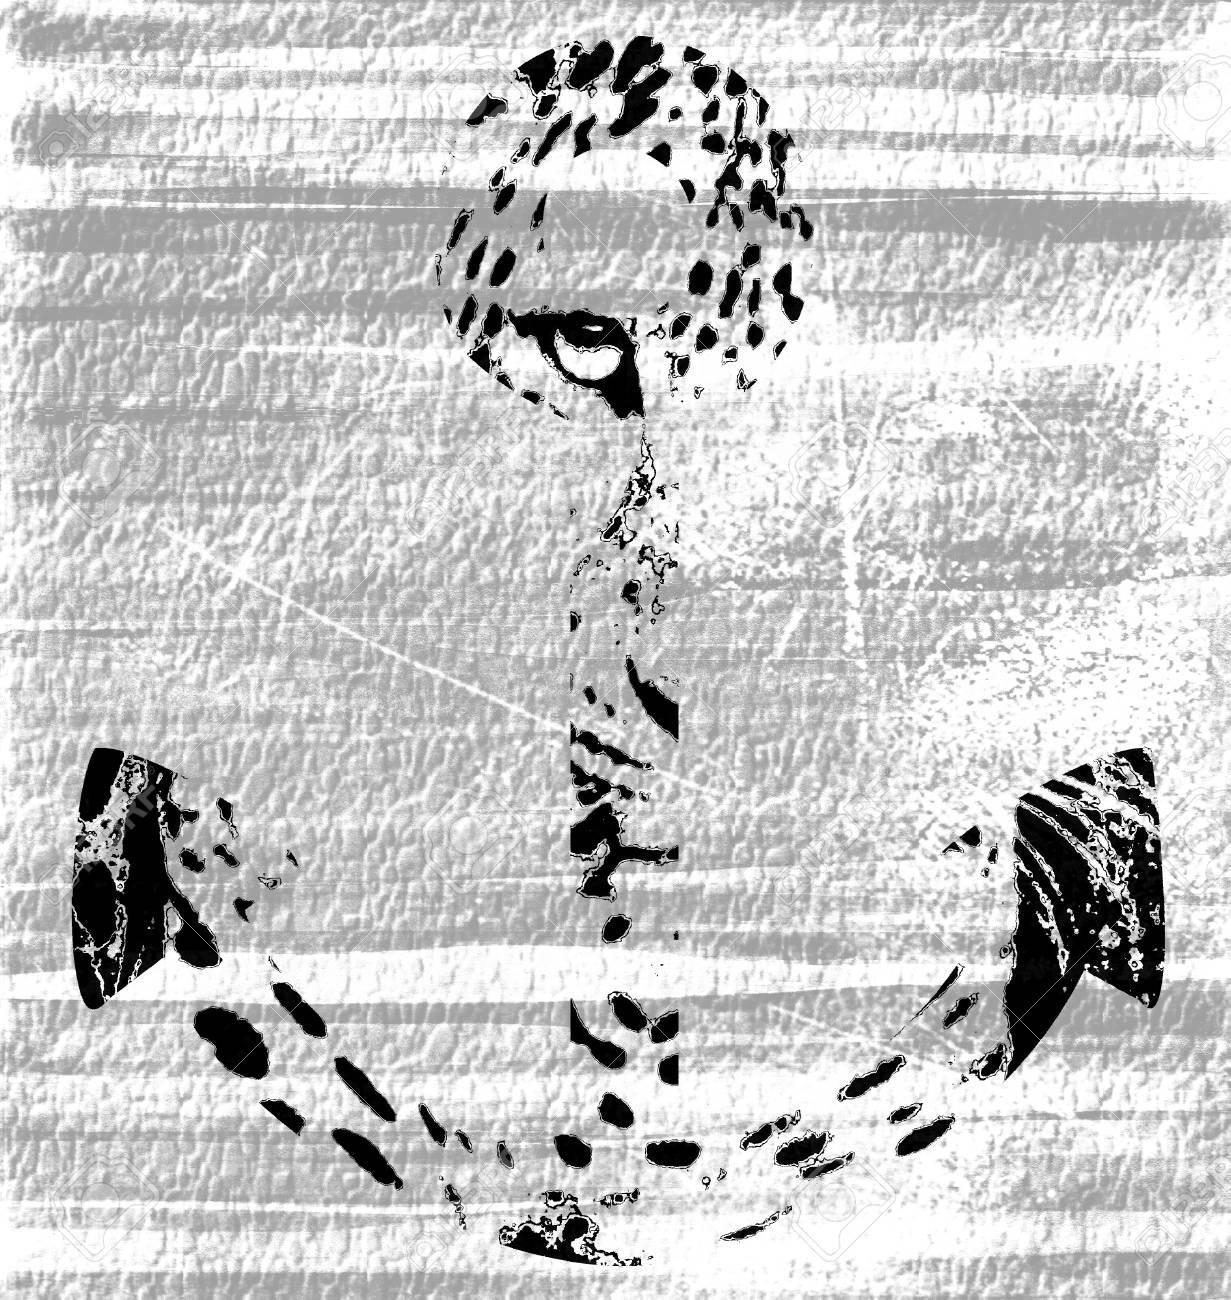 Black and White Anchor Leopard Eye Overlay Grunge Background Stock Photo - 15049944